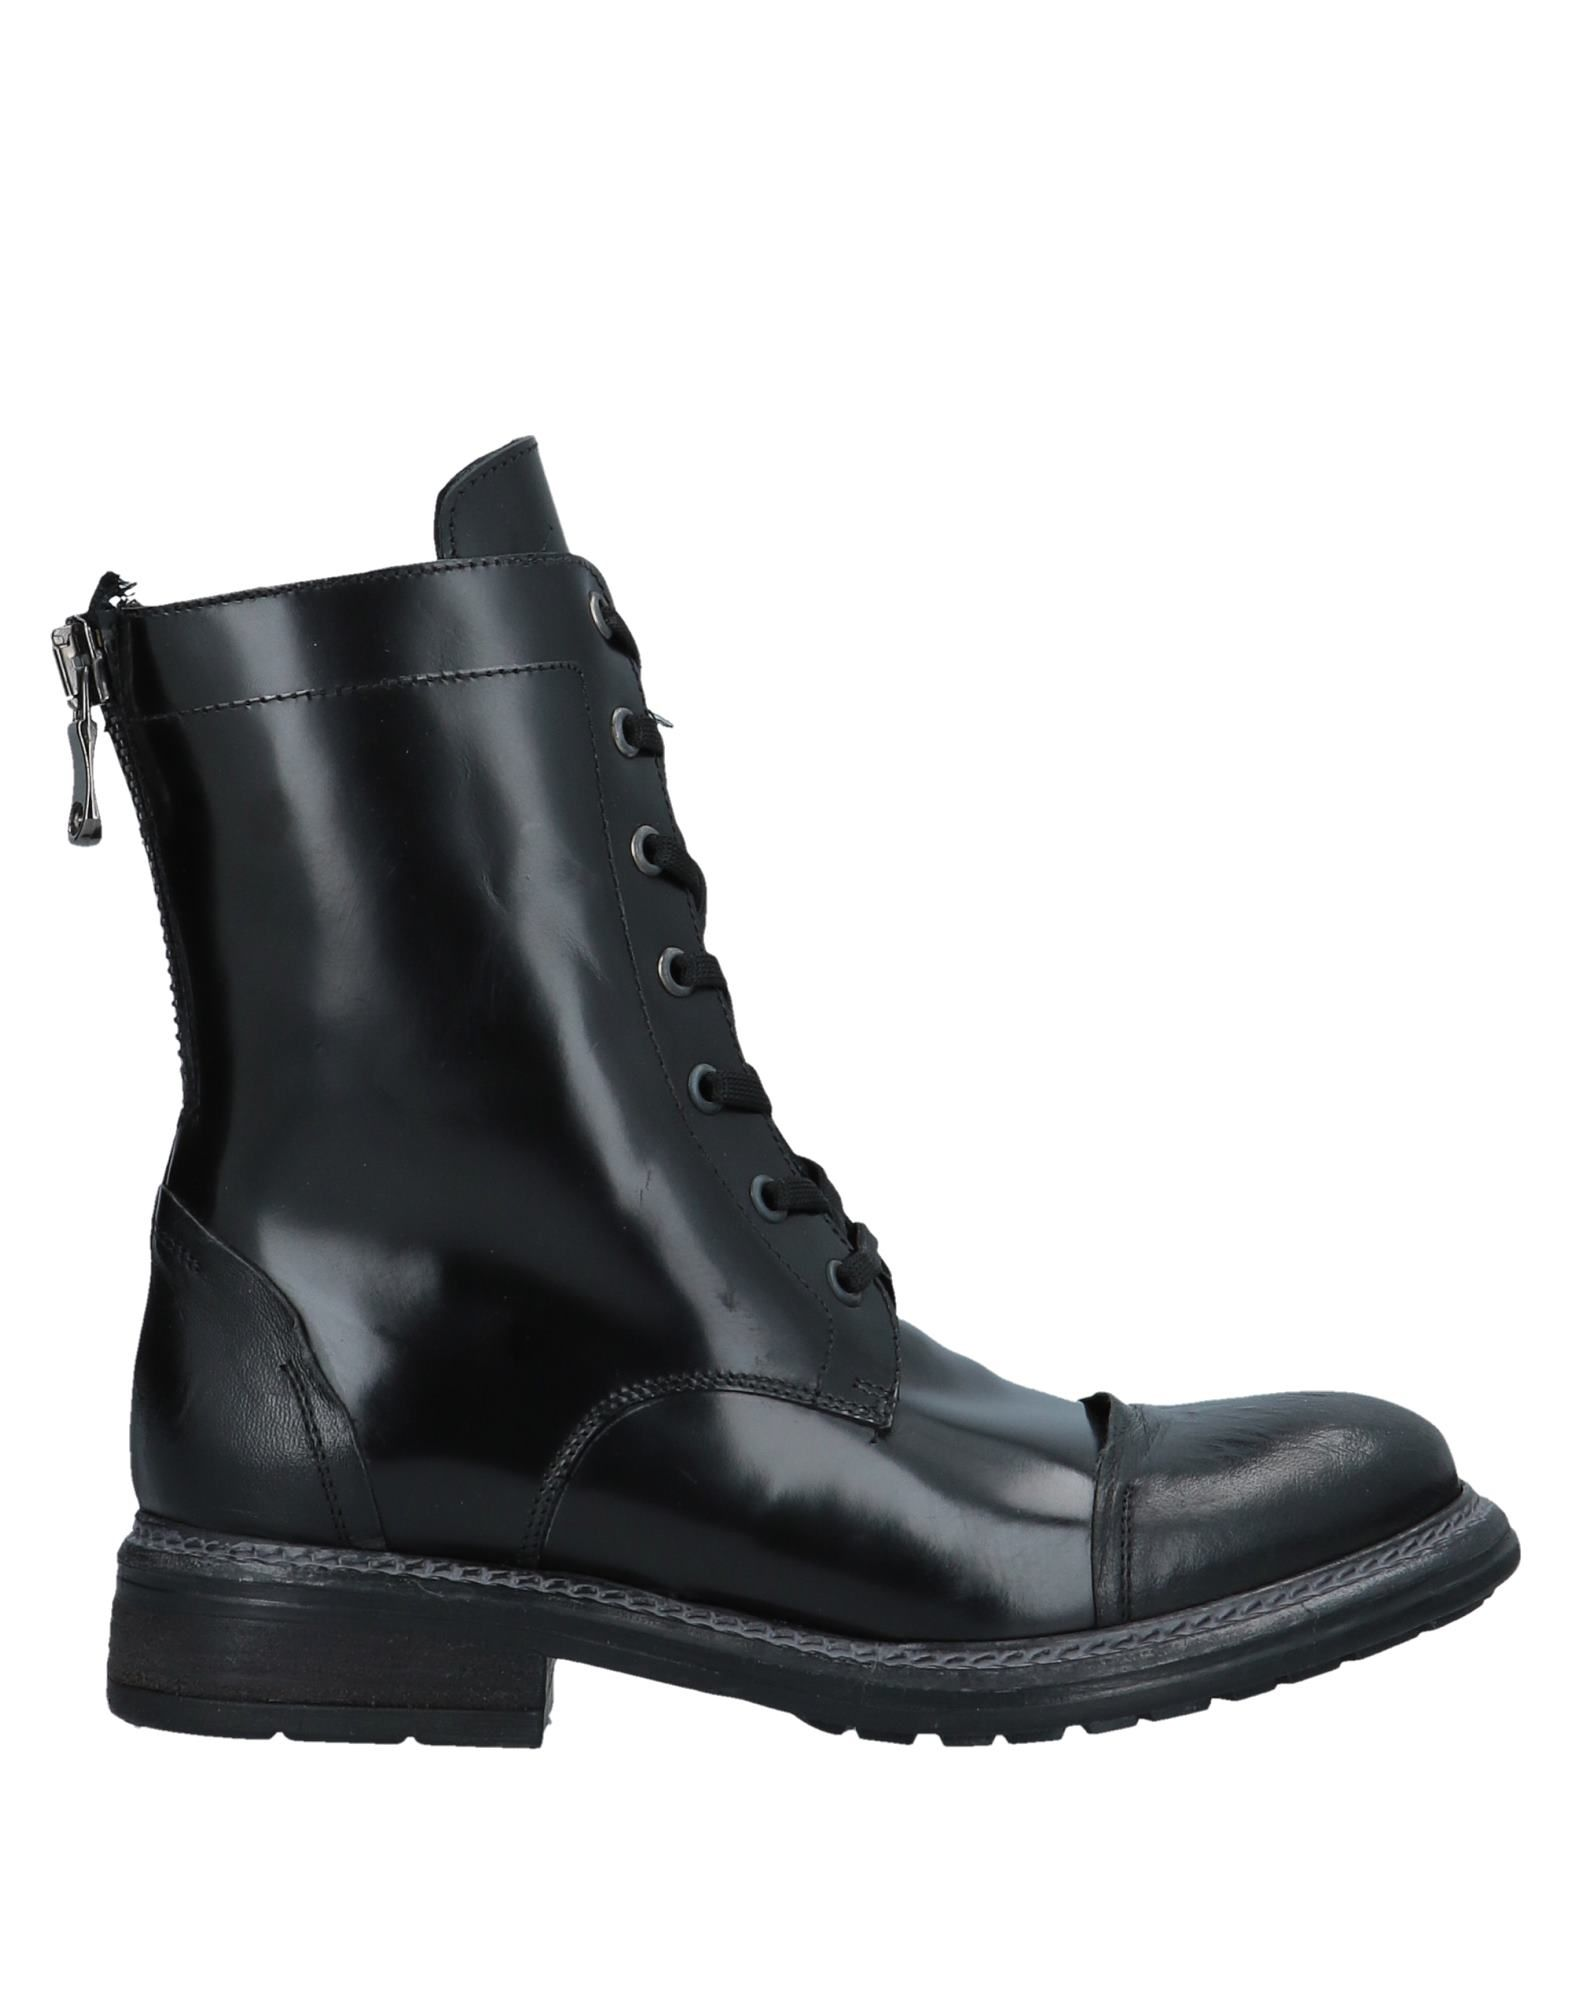 Paolina Perez Stiefelette Damen  11532590XP Gute Qualität beliebte Schuhe